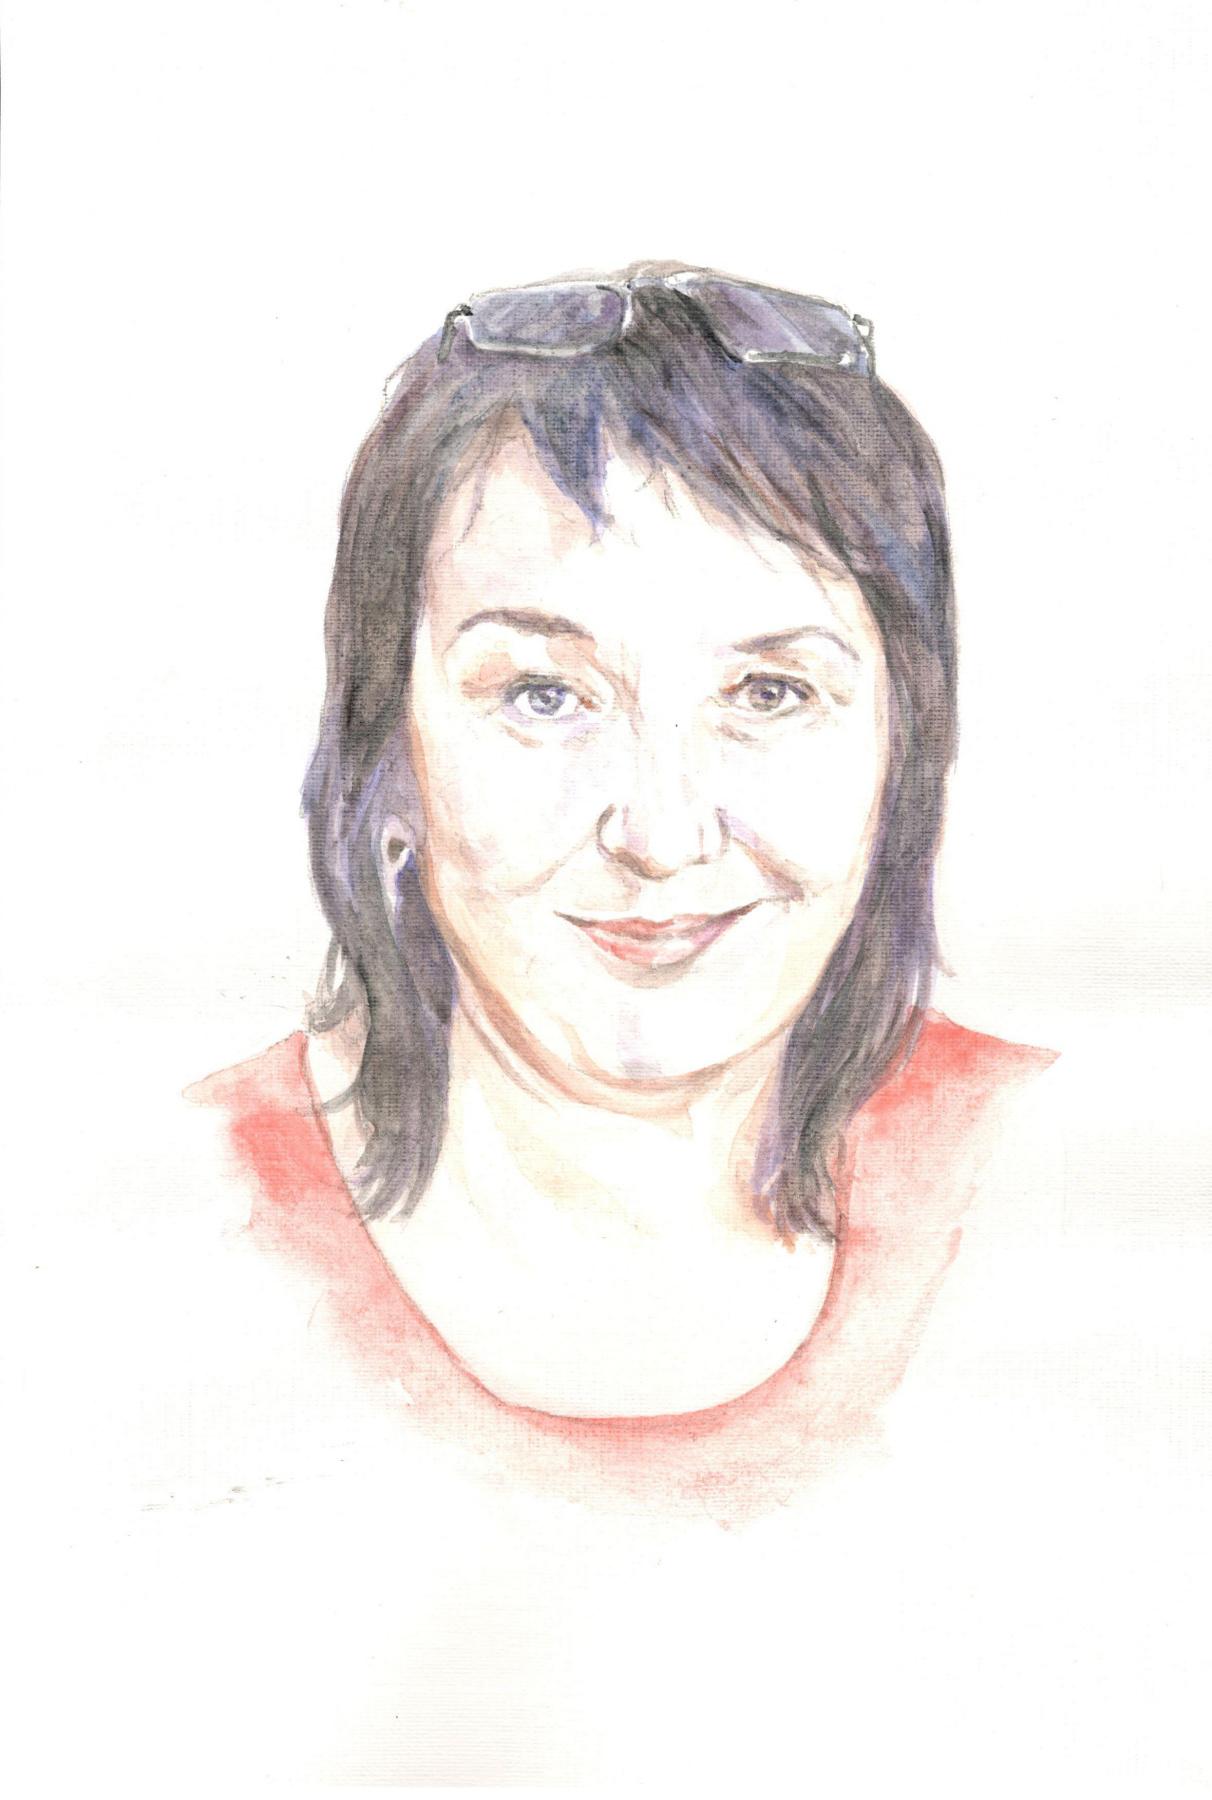 Ivan Alexandrovich Dolgorukov. Watercolor portrait by TV Miroshnichenko.